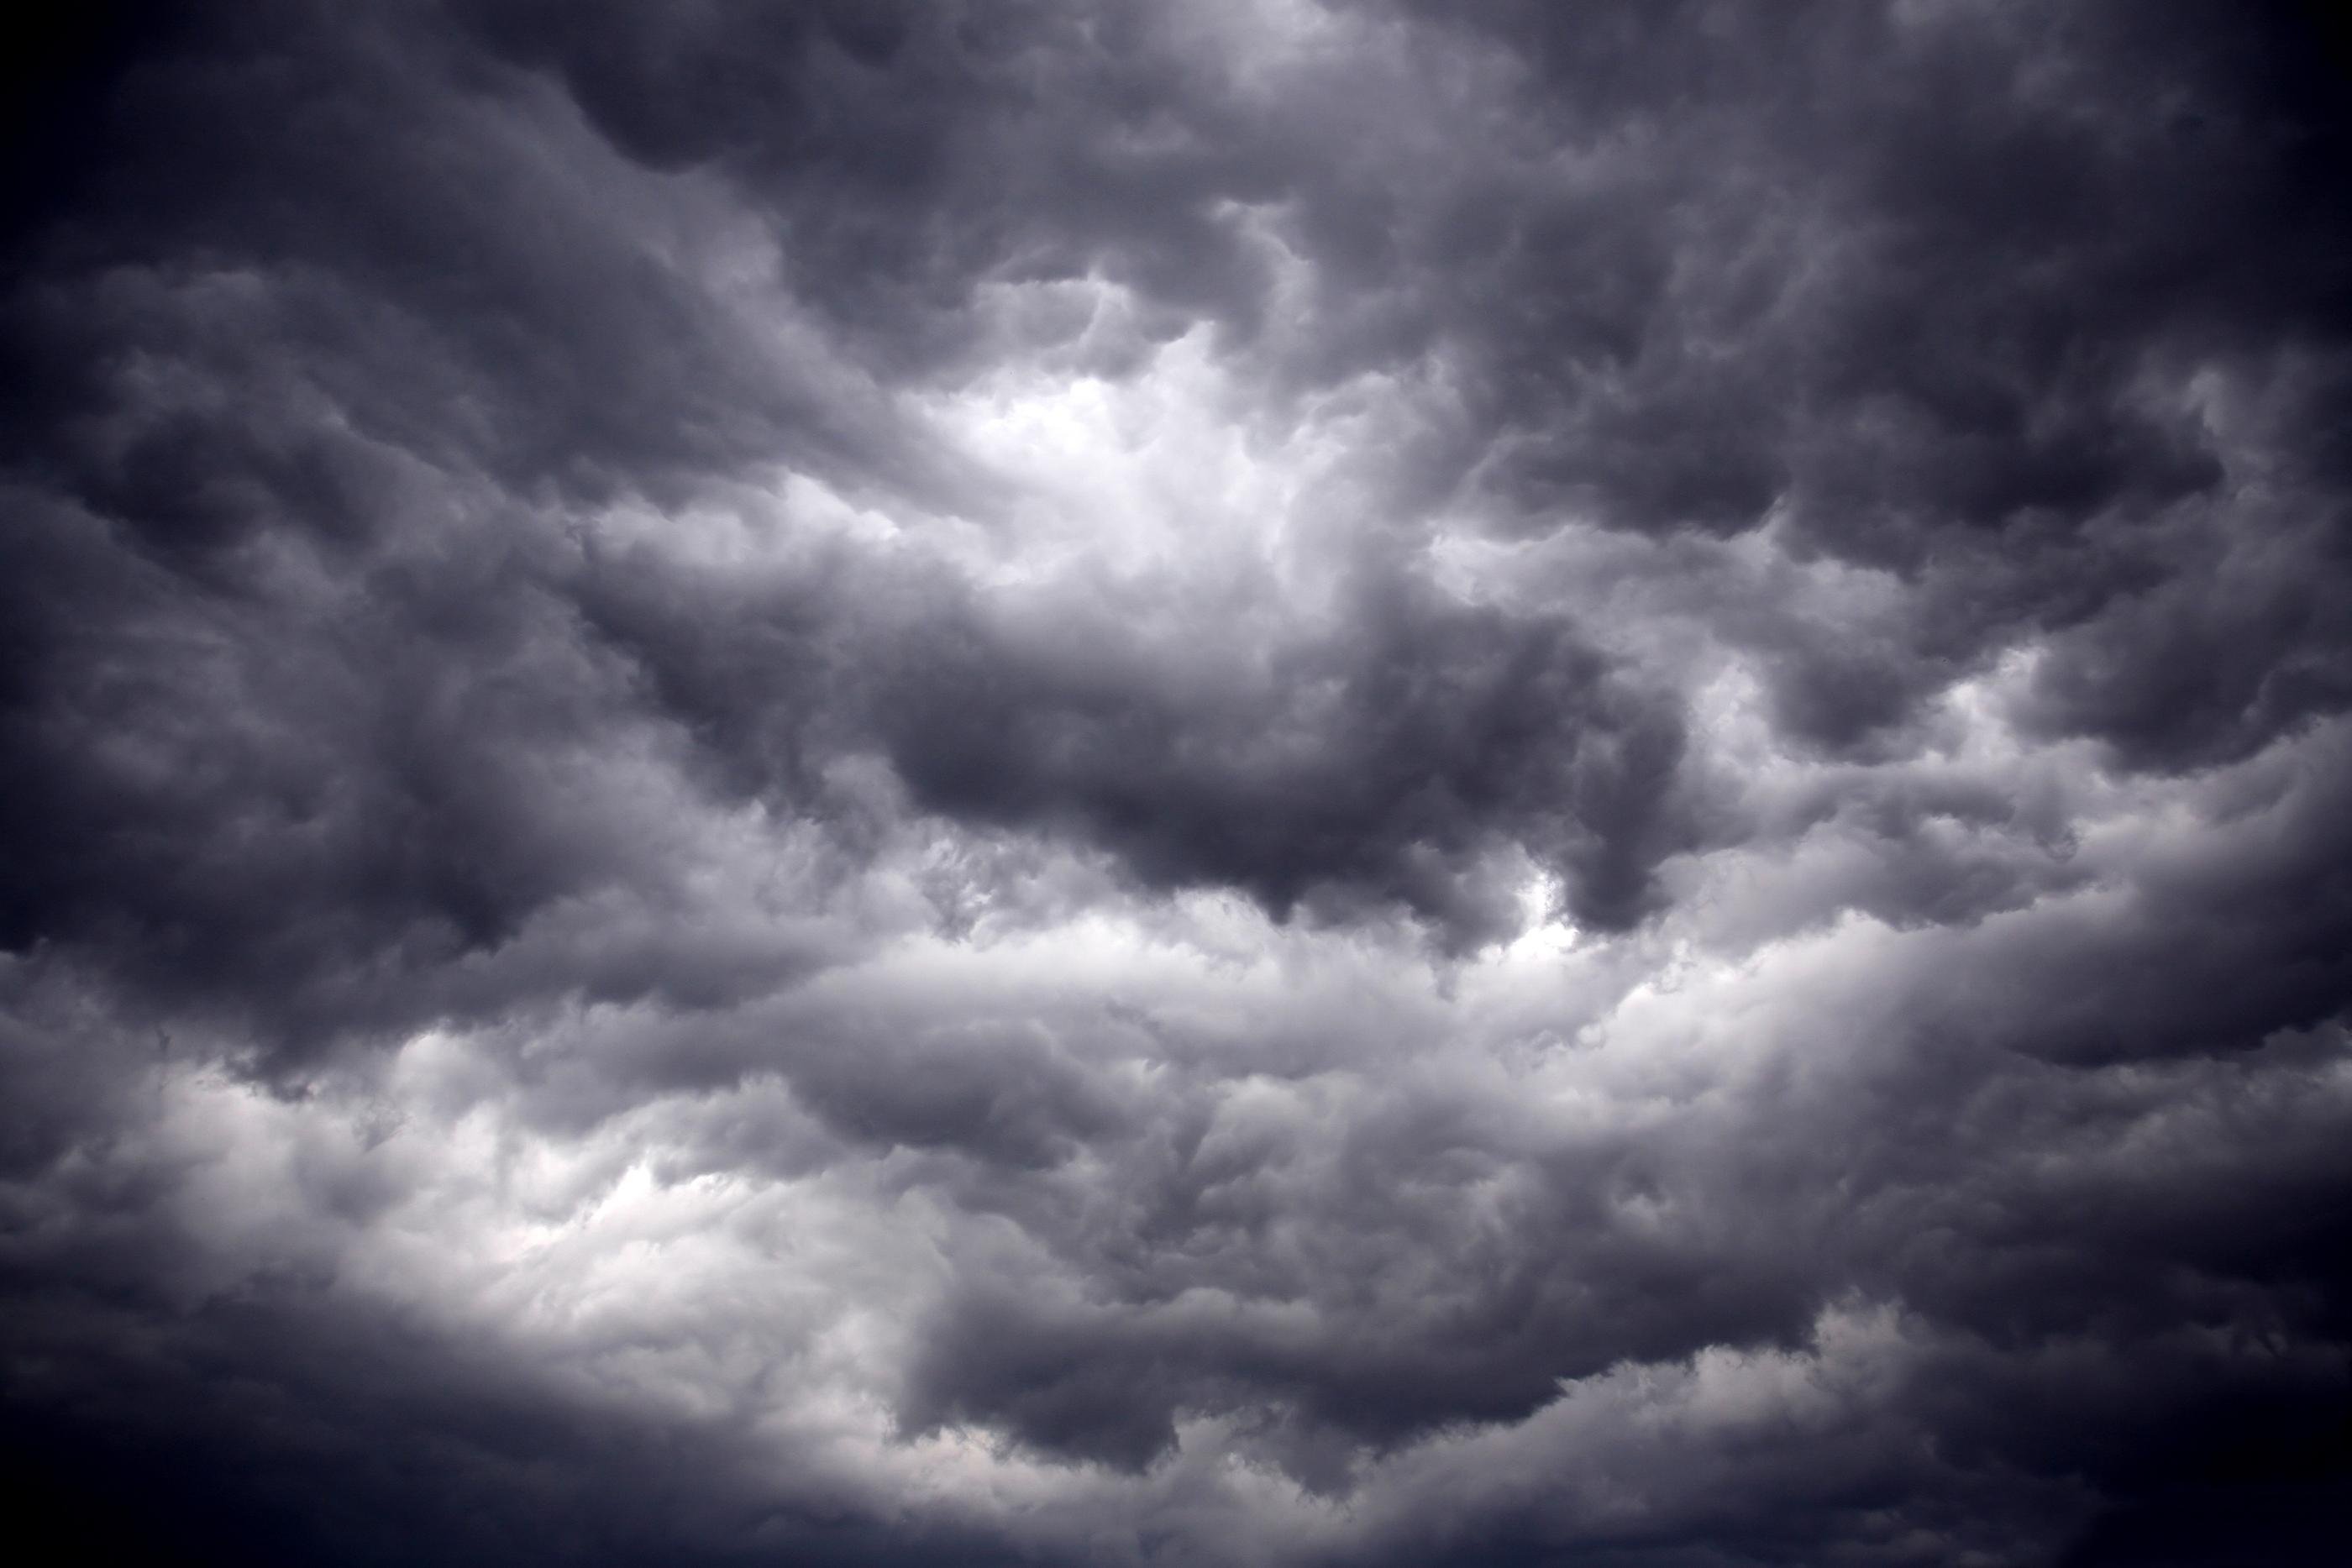 Team Sky Iphone Wallpaper Heavy Gale Black Stormy Clouds Altigen